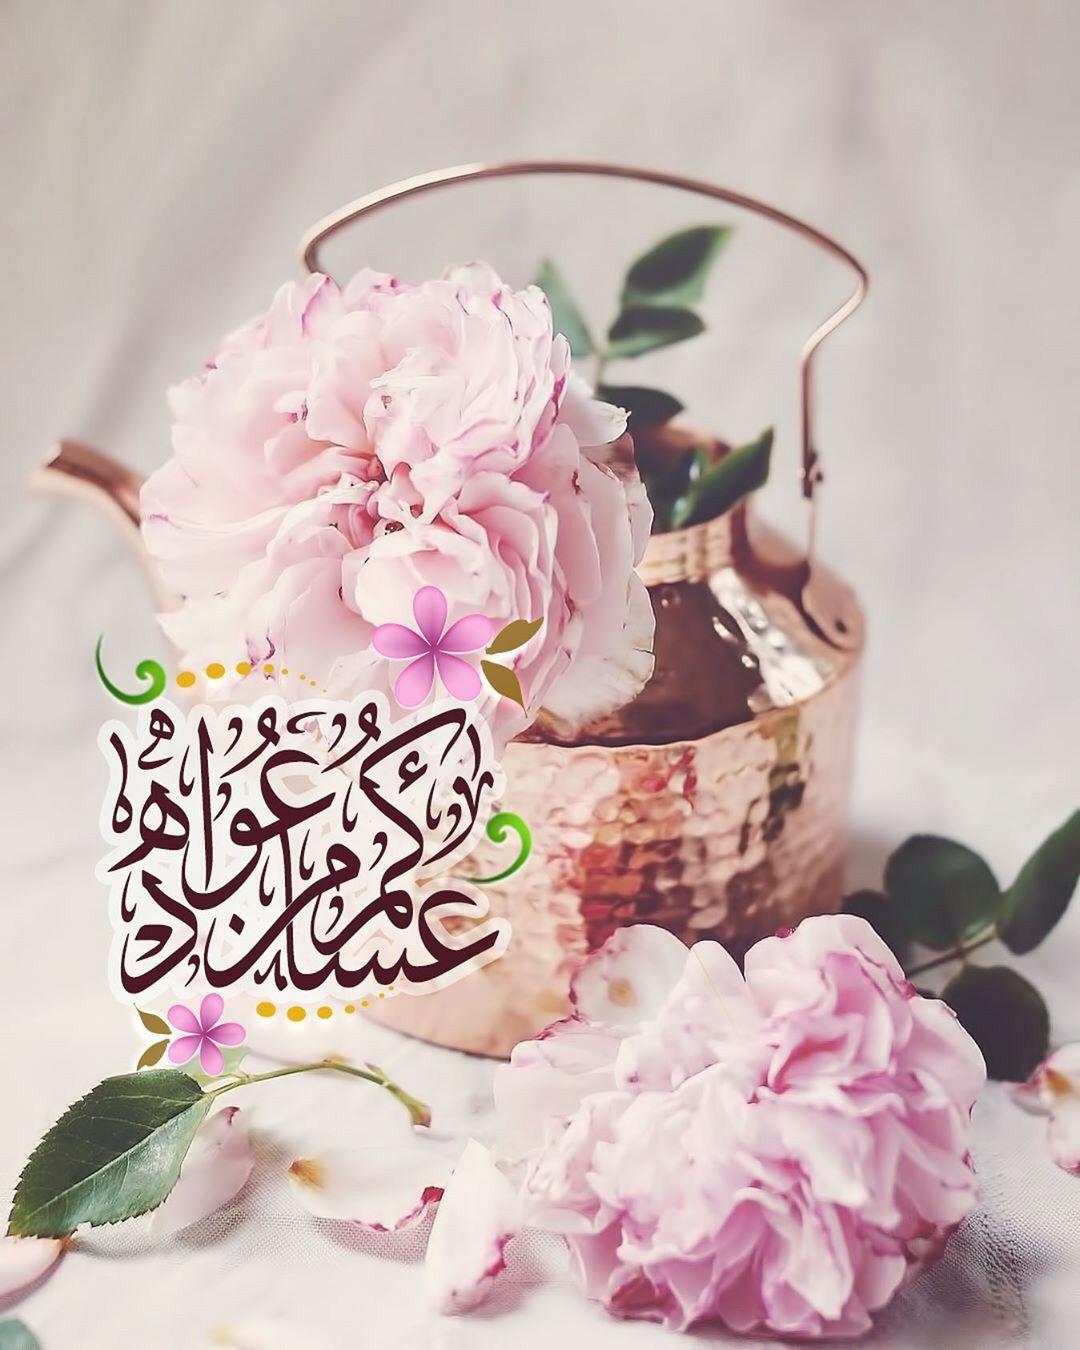 Pin By Moses Moudy On تهاني العيد الفطر المبارك لعام ١٤٤٠ Eid Mubarik Eid Greetings Eid Cards